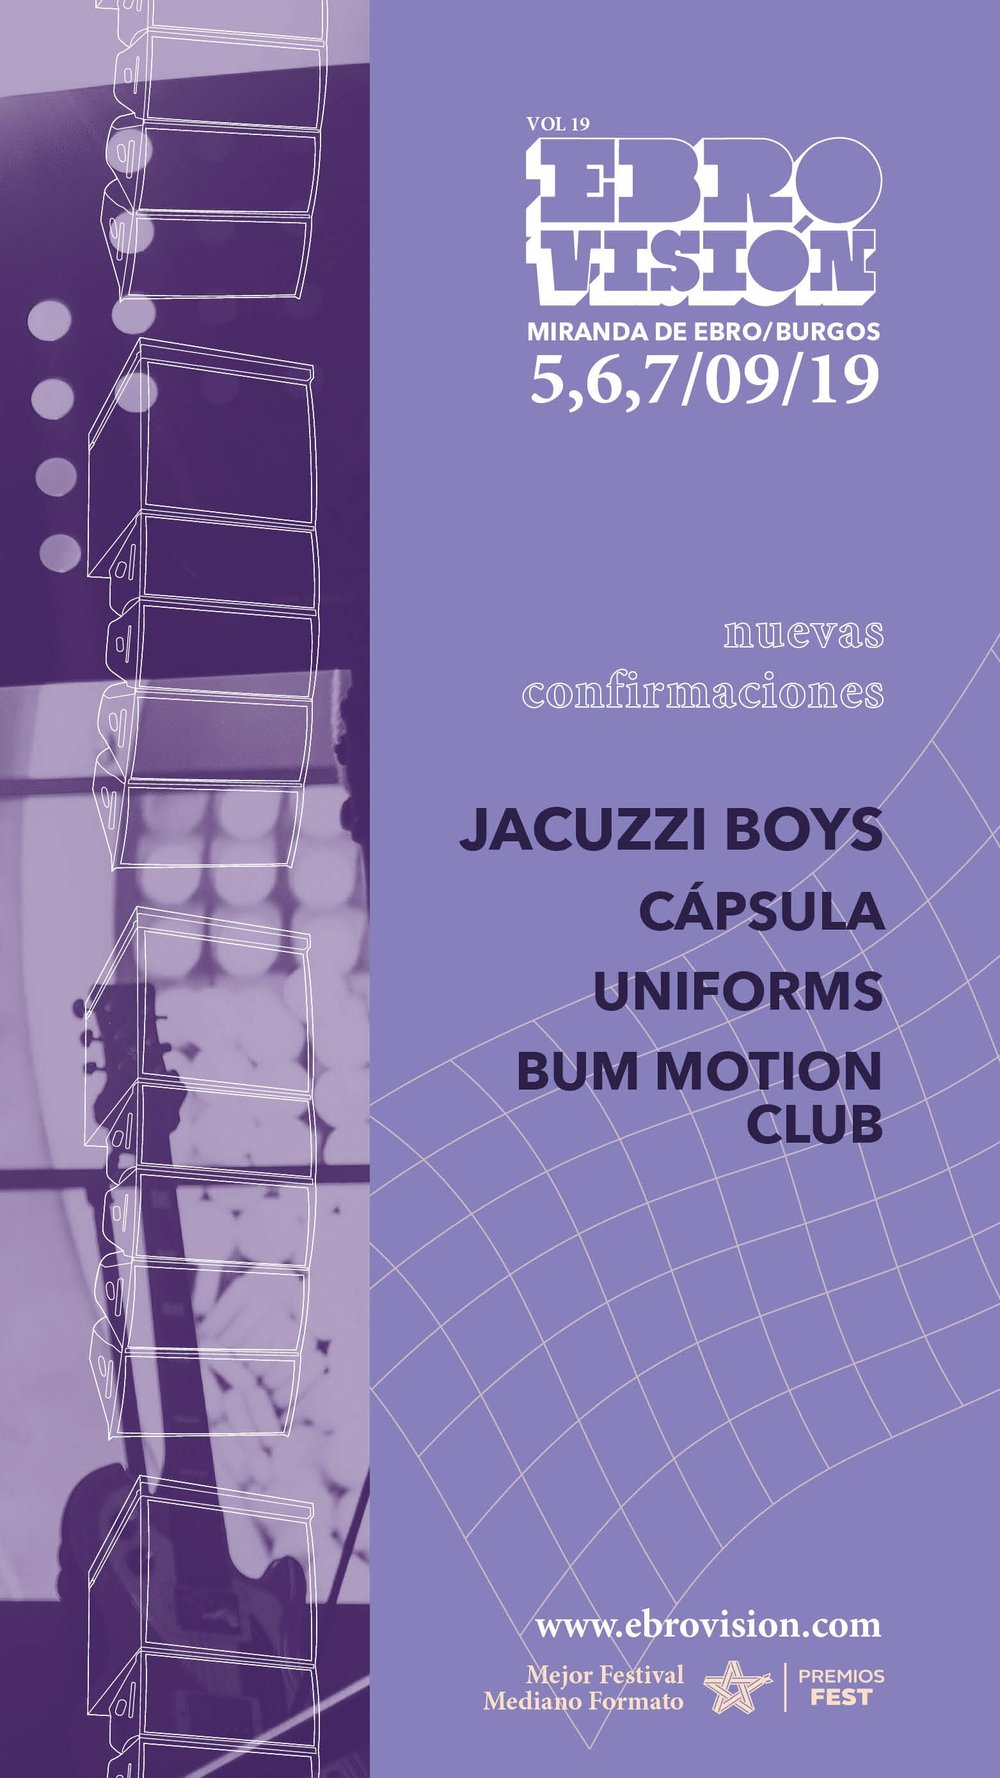 Capsula Ebrovision Confirmaciones Jacuzzi Boys Uniforms Bum Motion Club